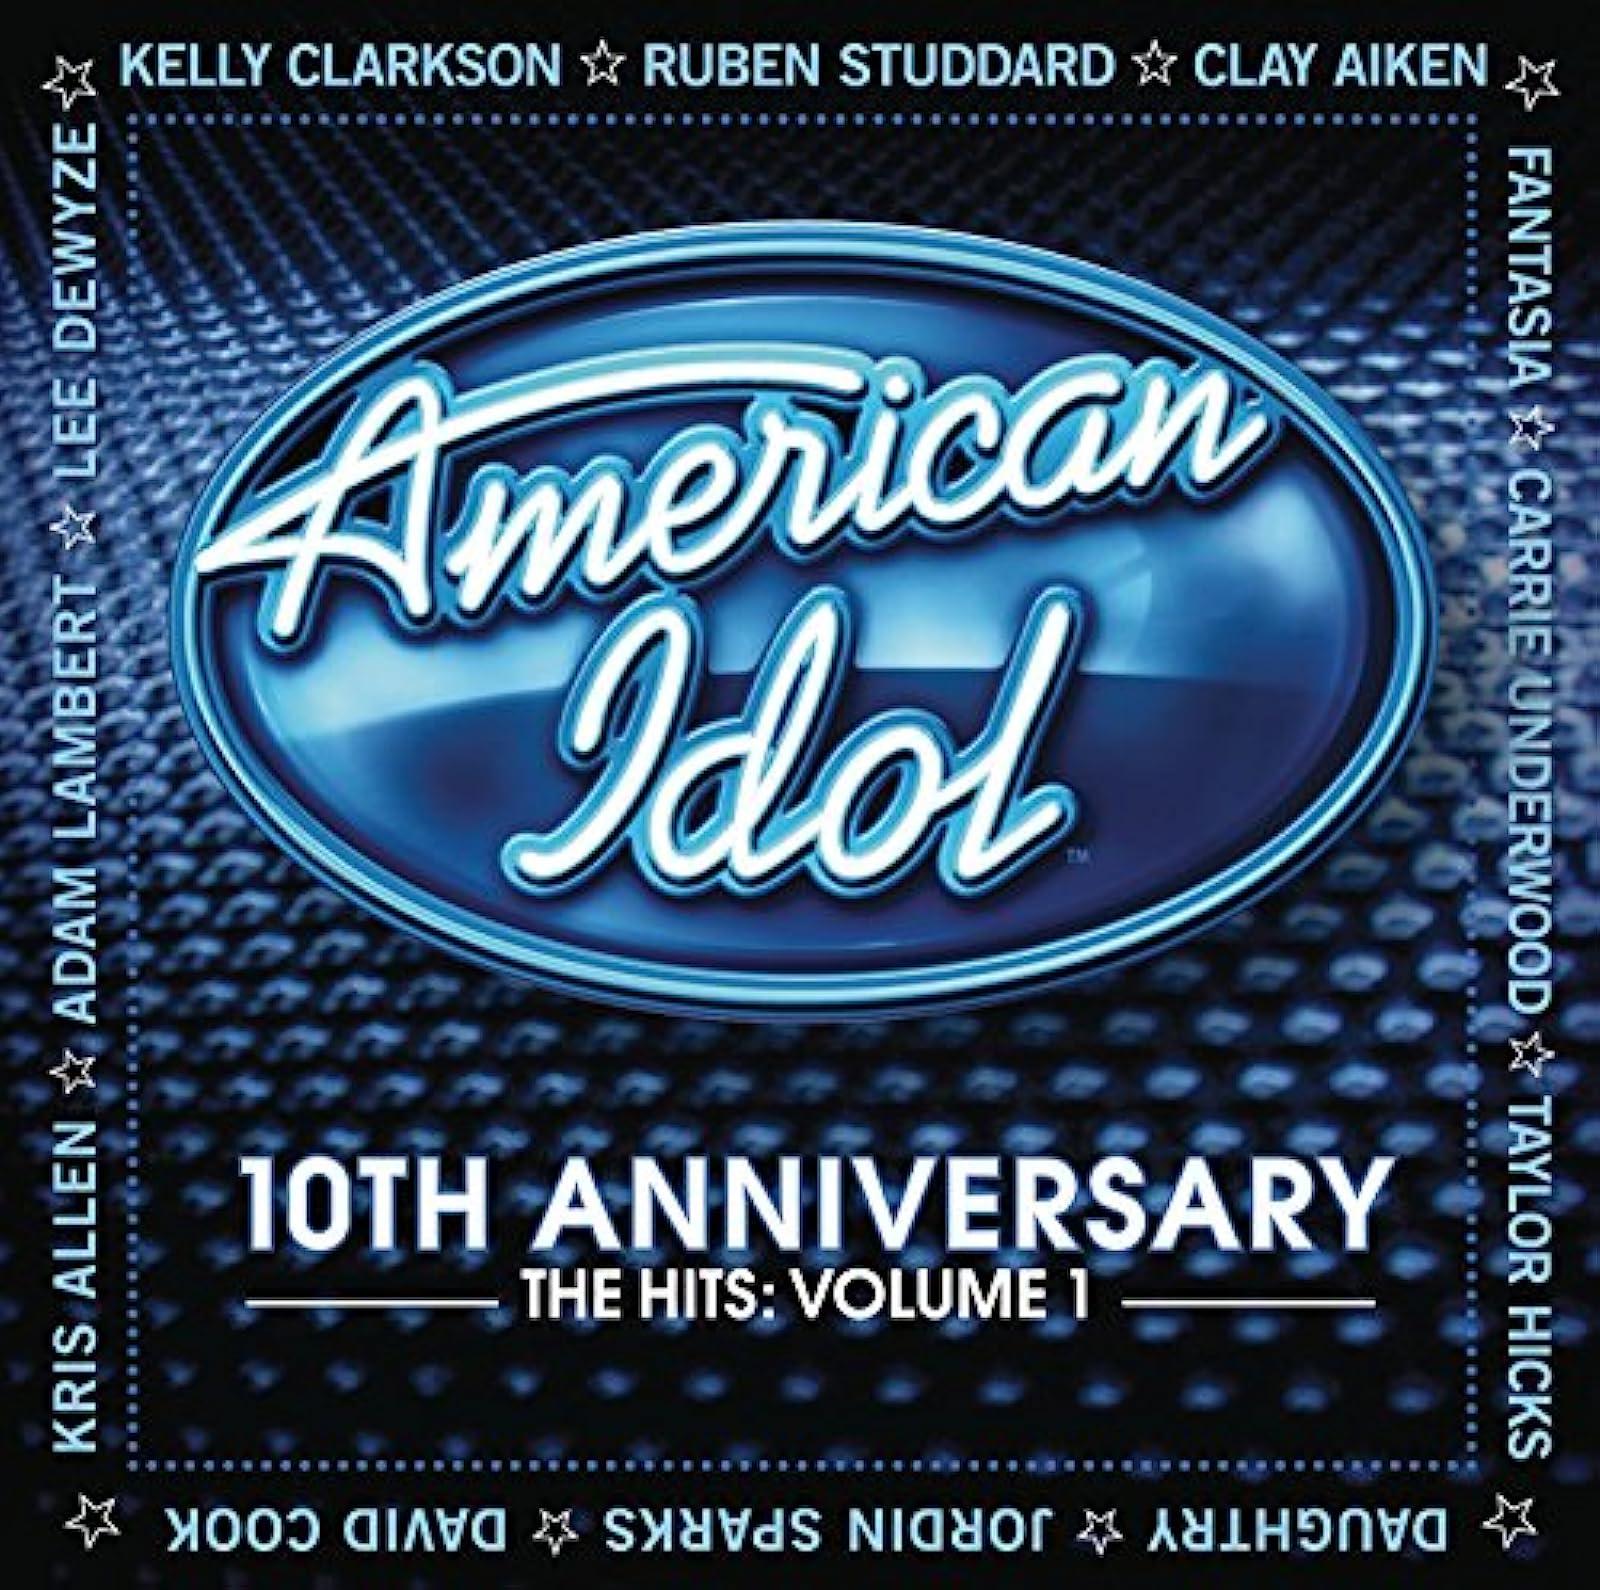 10th Anniversary The Hits Vol 1 On Audio CD Album Pop 2011